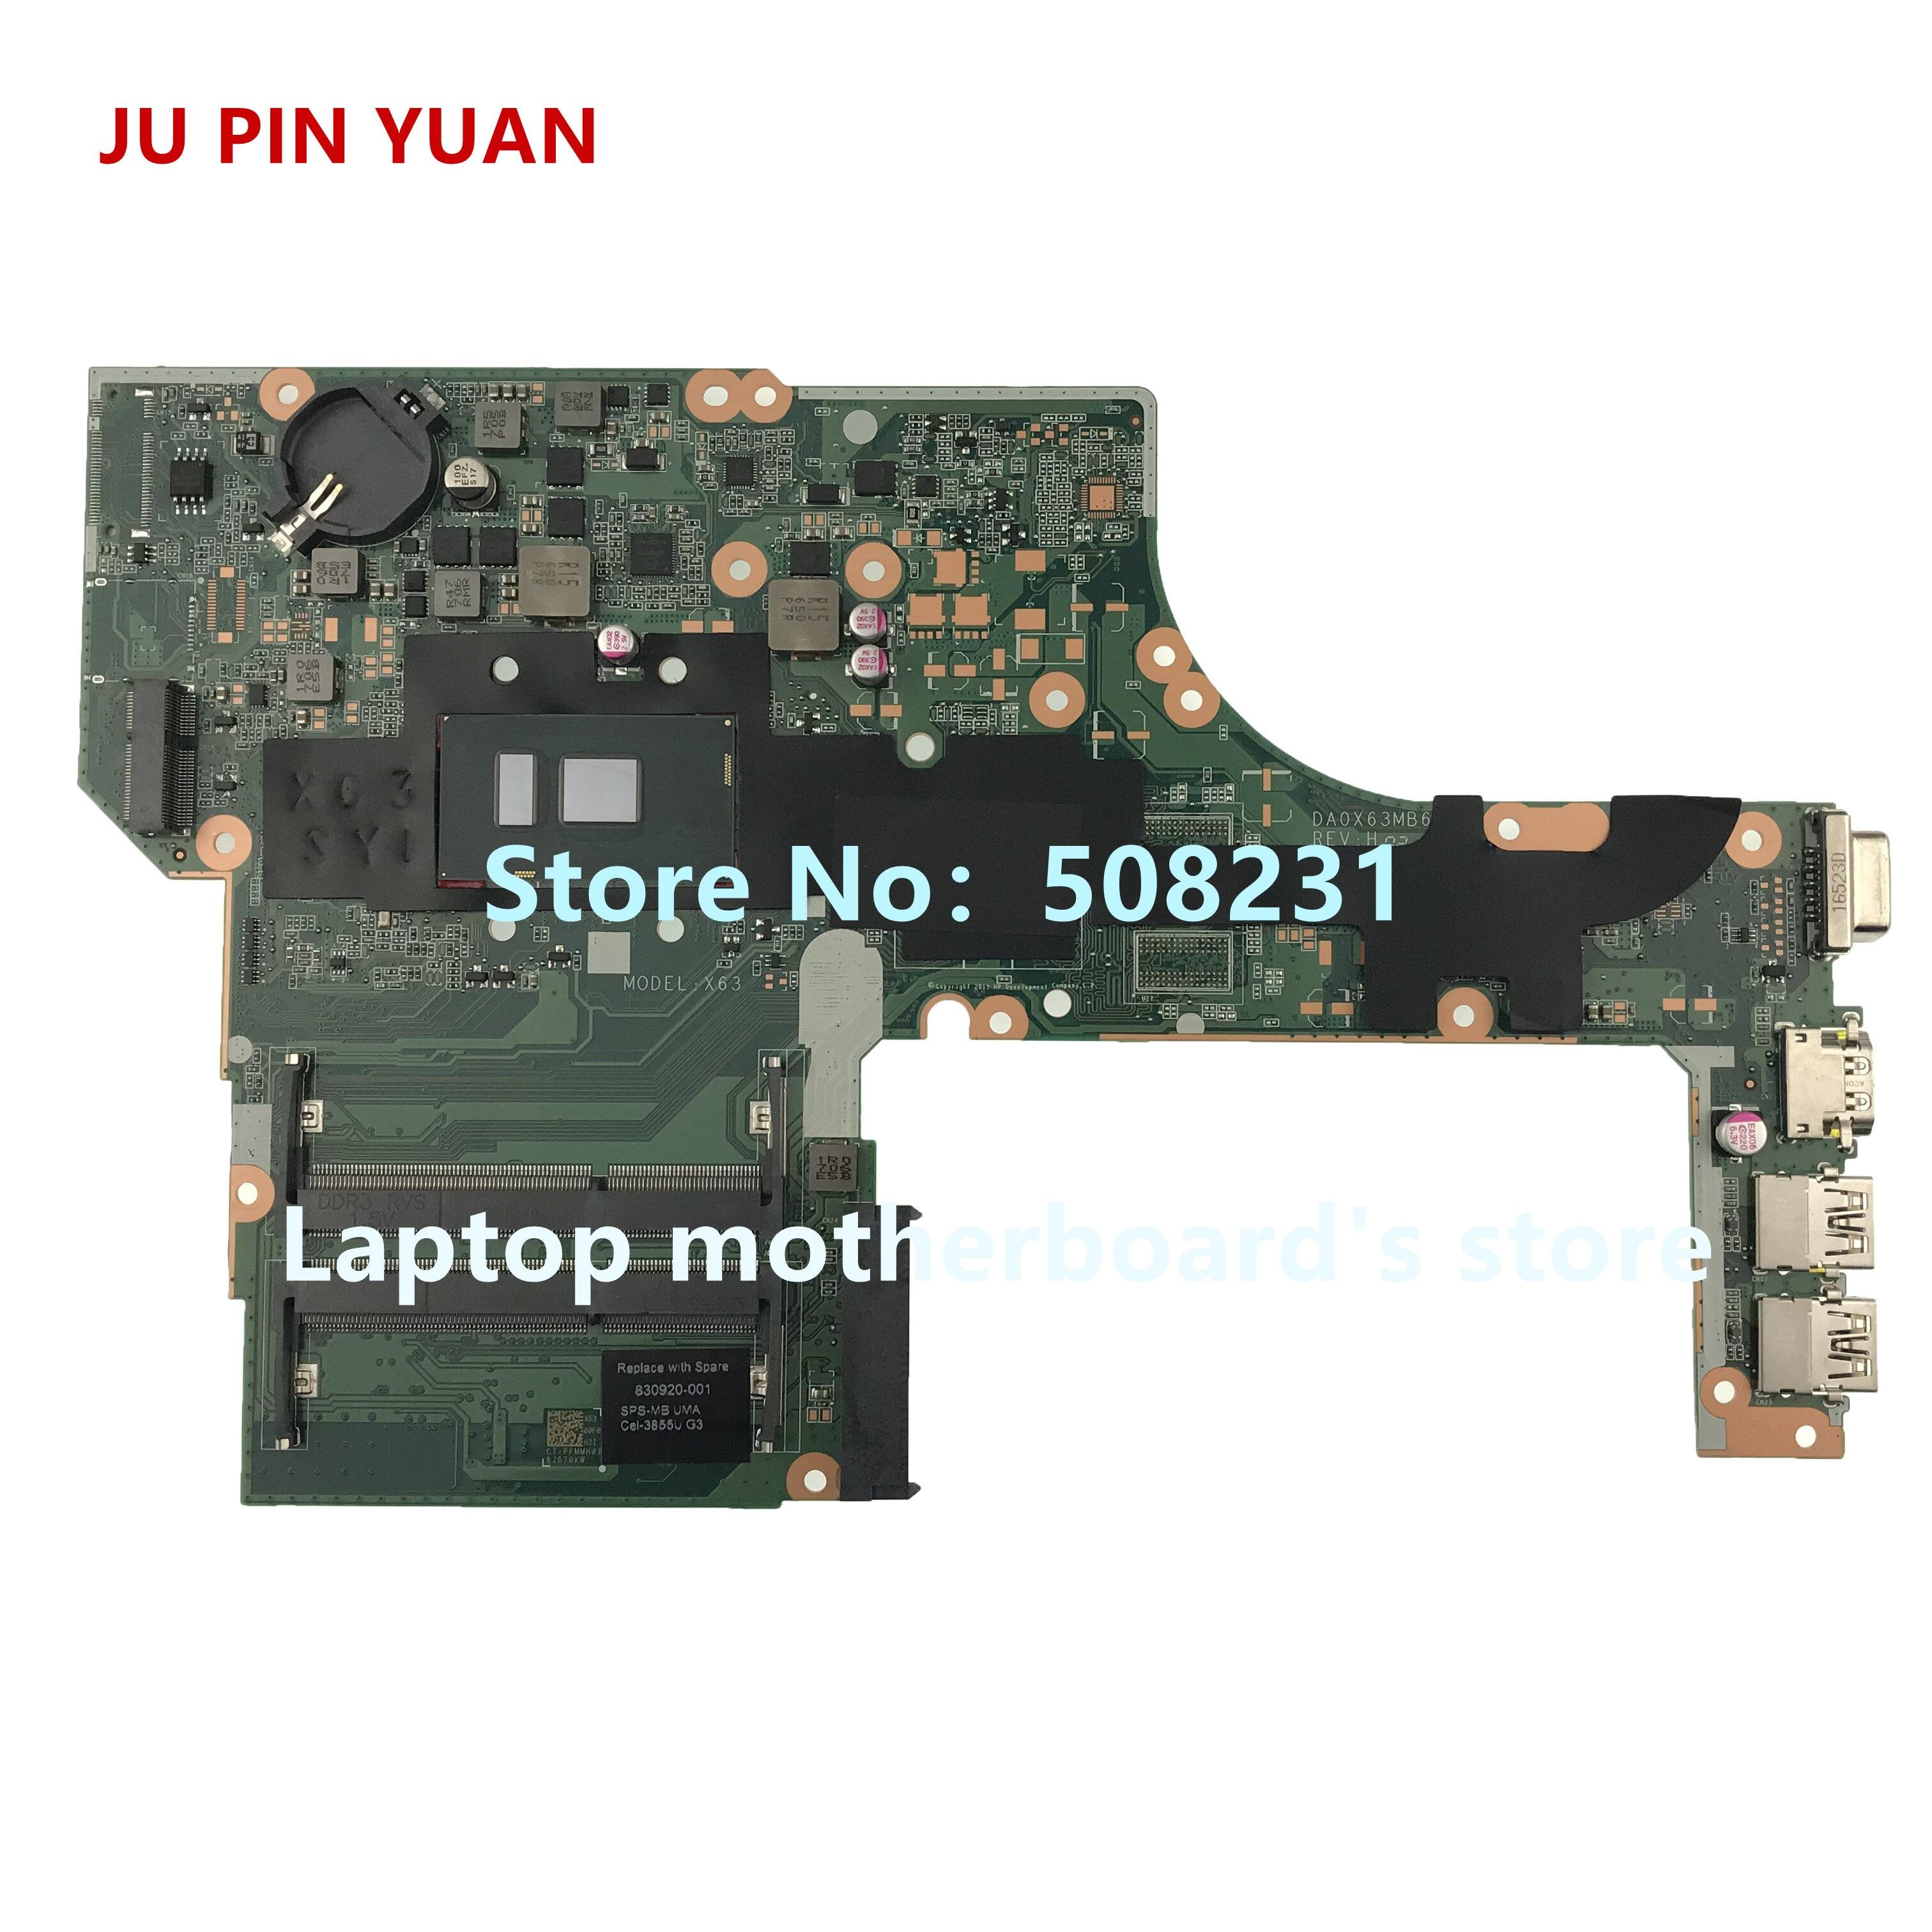 JU PIN YUAN-اللوحة الأم للكمبيوتر المحمول HP 830920 G3 ، اللوحة الرئيسية للكمبيوتر المحمول HP 830920-001 501-830920 601-450 DA0X63MB6H1 مع 3855U تم اختباره بالكامل